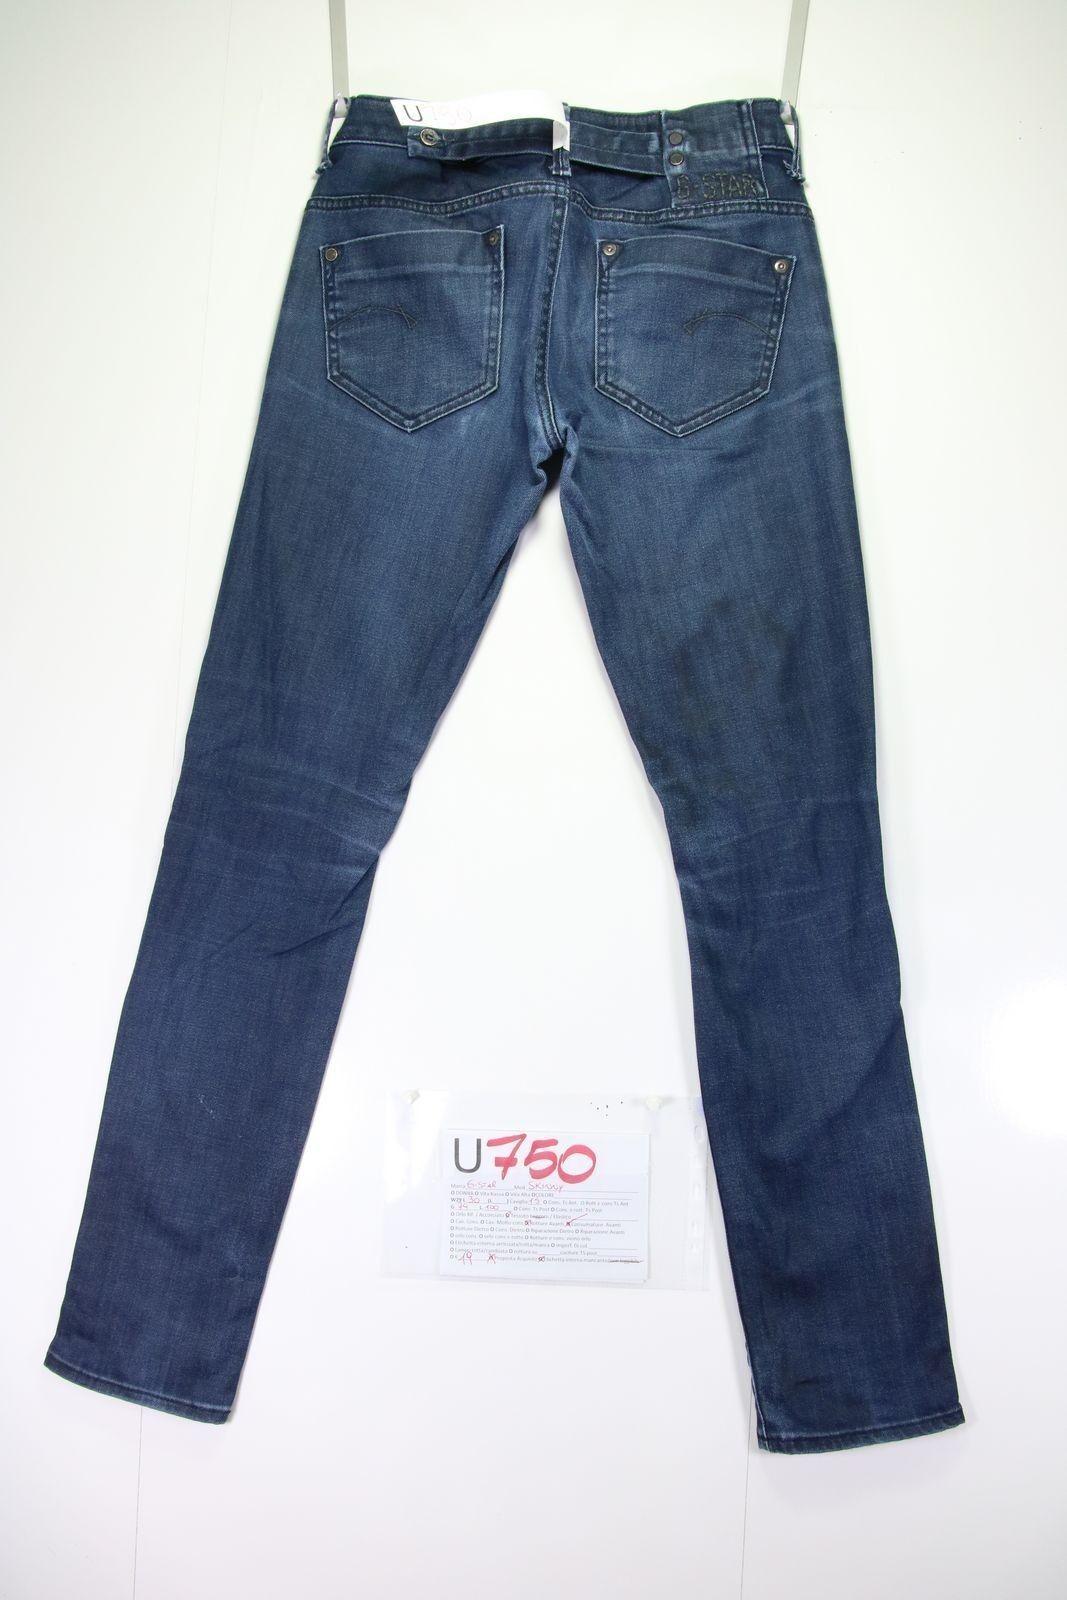 Levi's jeans 501 destroyed(Cod.U749)tg43 W29 L34 jeans Levi's usato vintage cae5f7